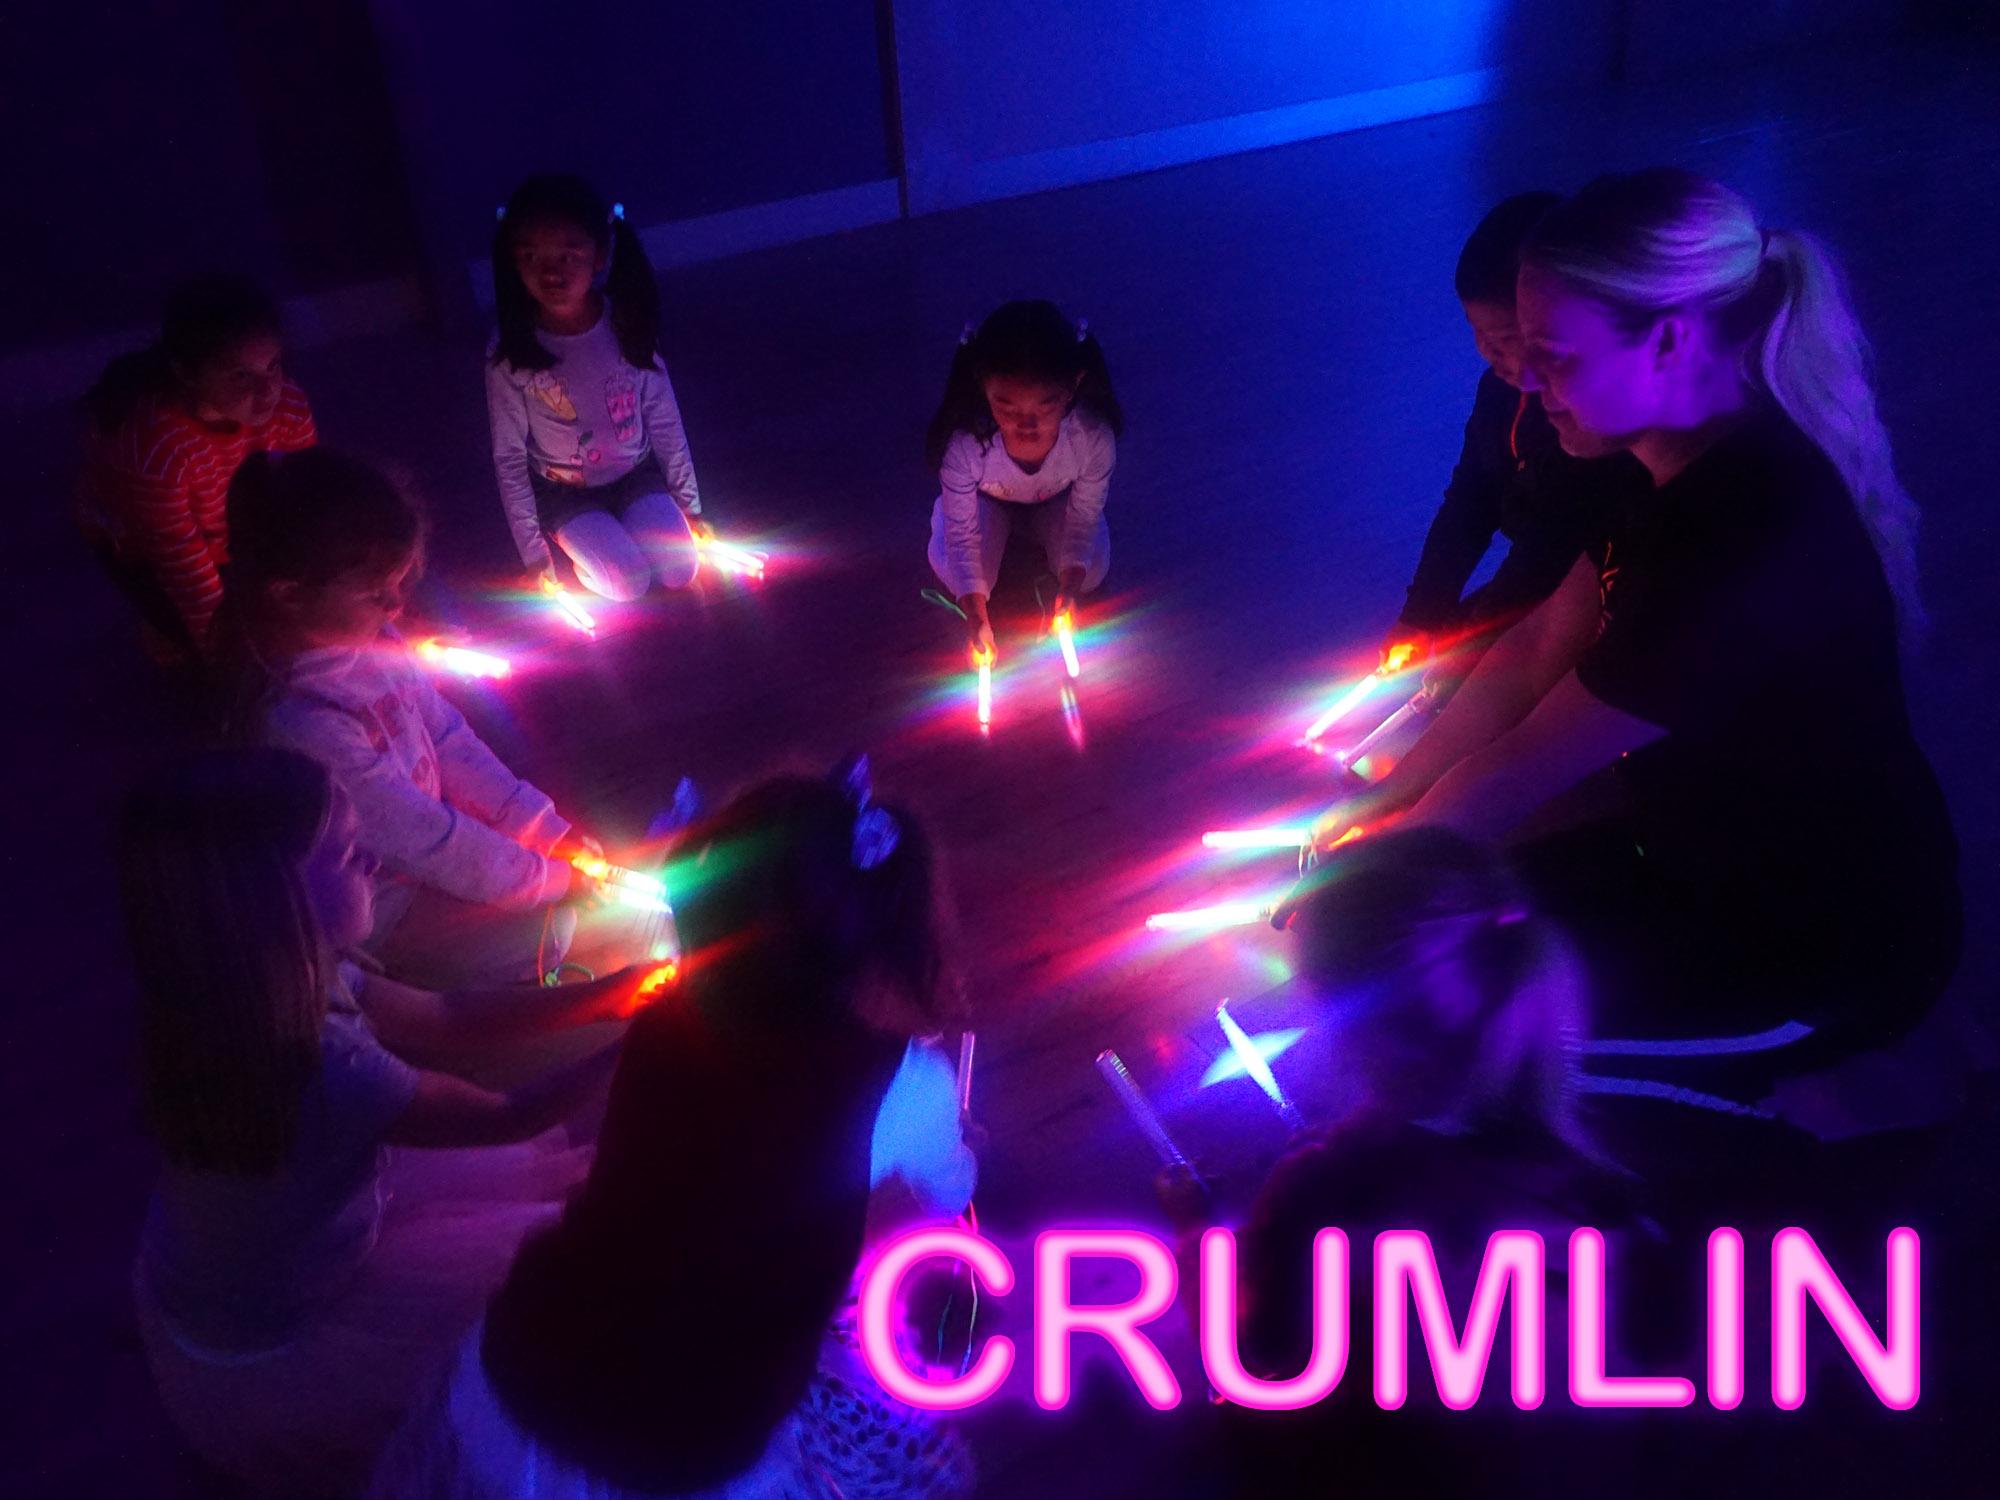 Crumlin photo.jpg